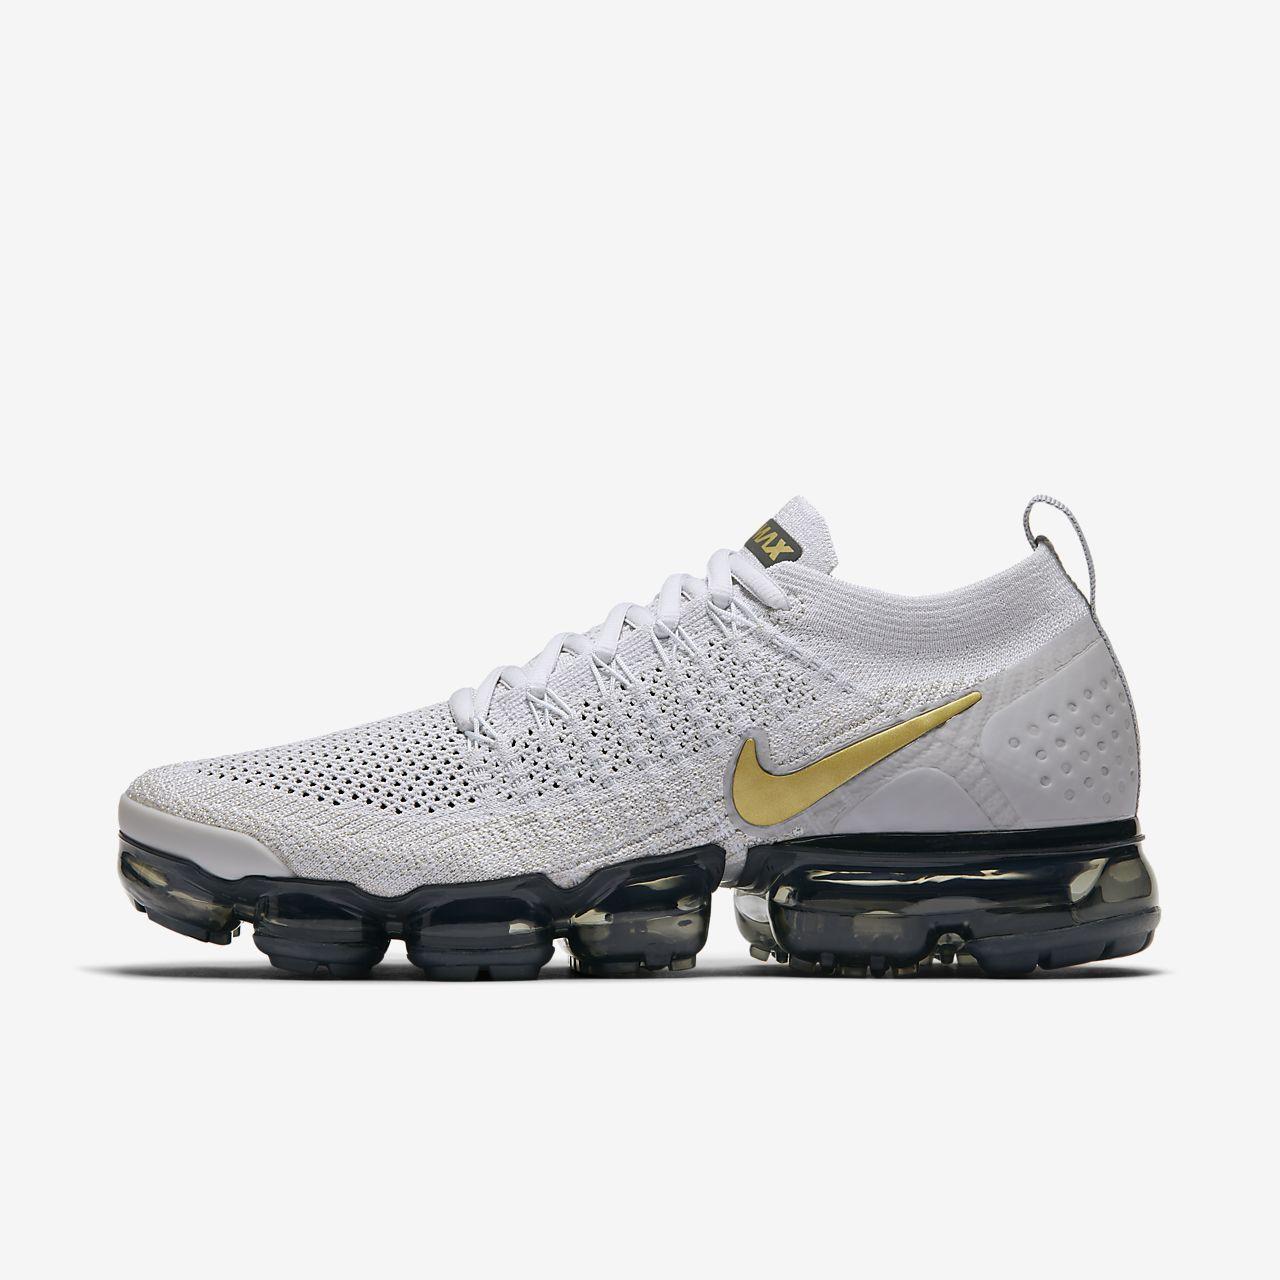 sports shoes 0d84a d44ba ... Nike Air VaporMax Flyknit 2 sko til dame